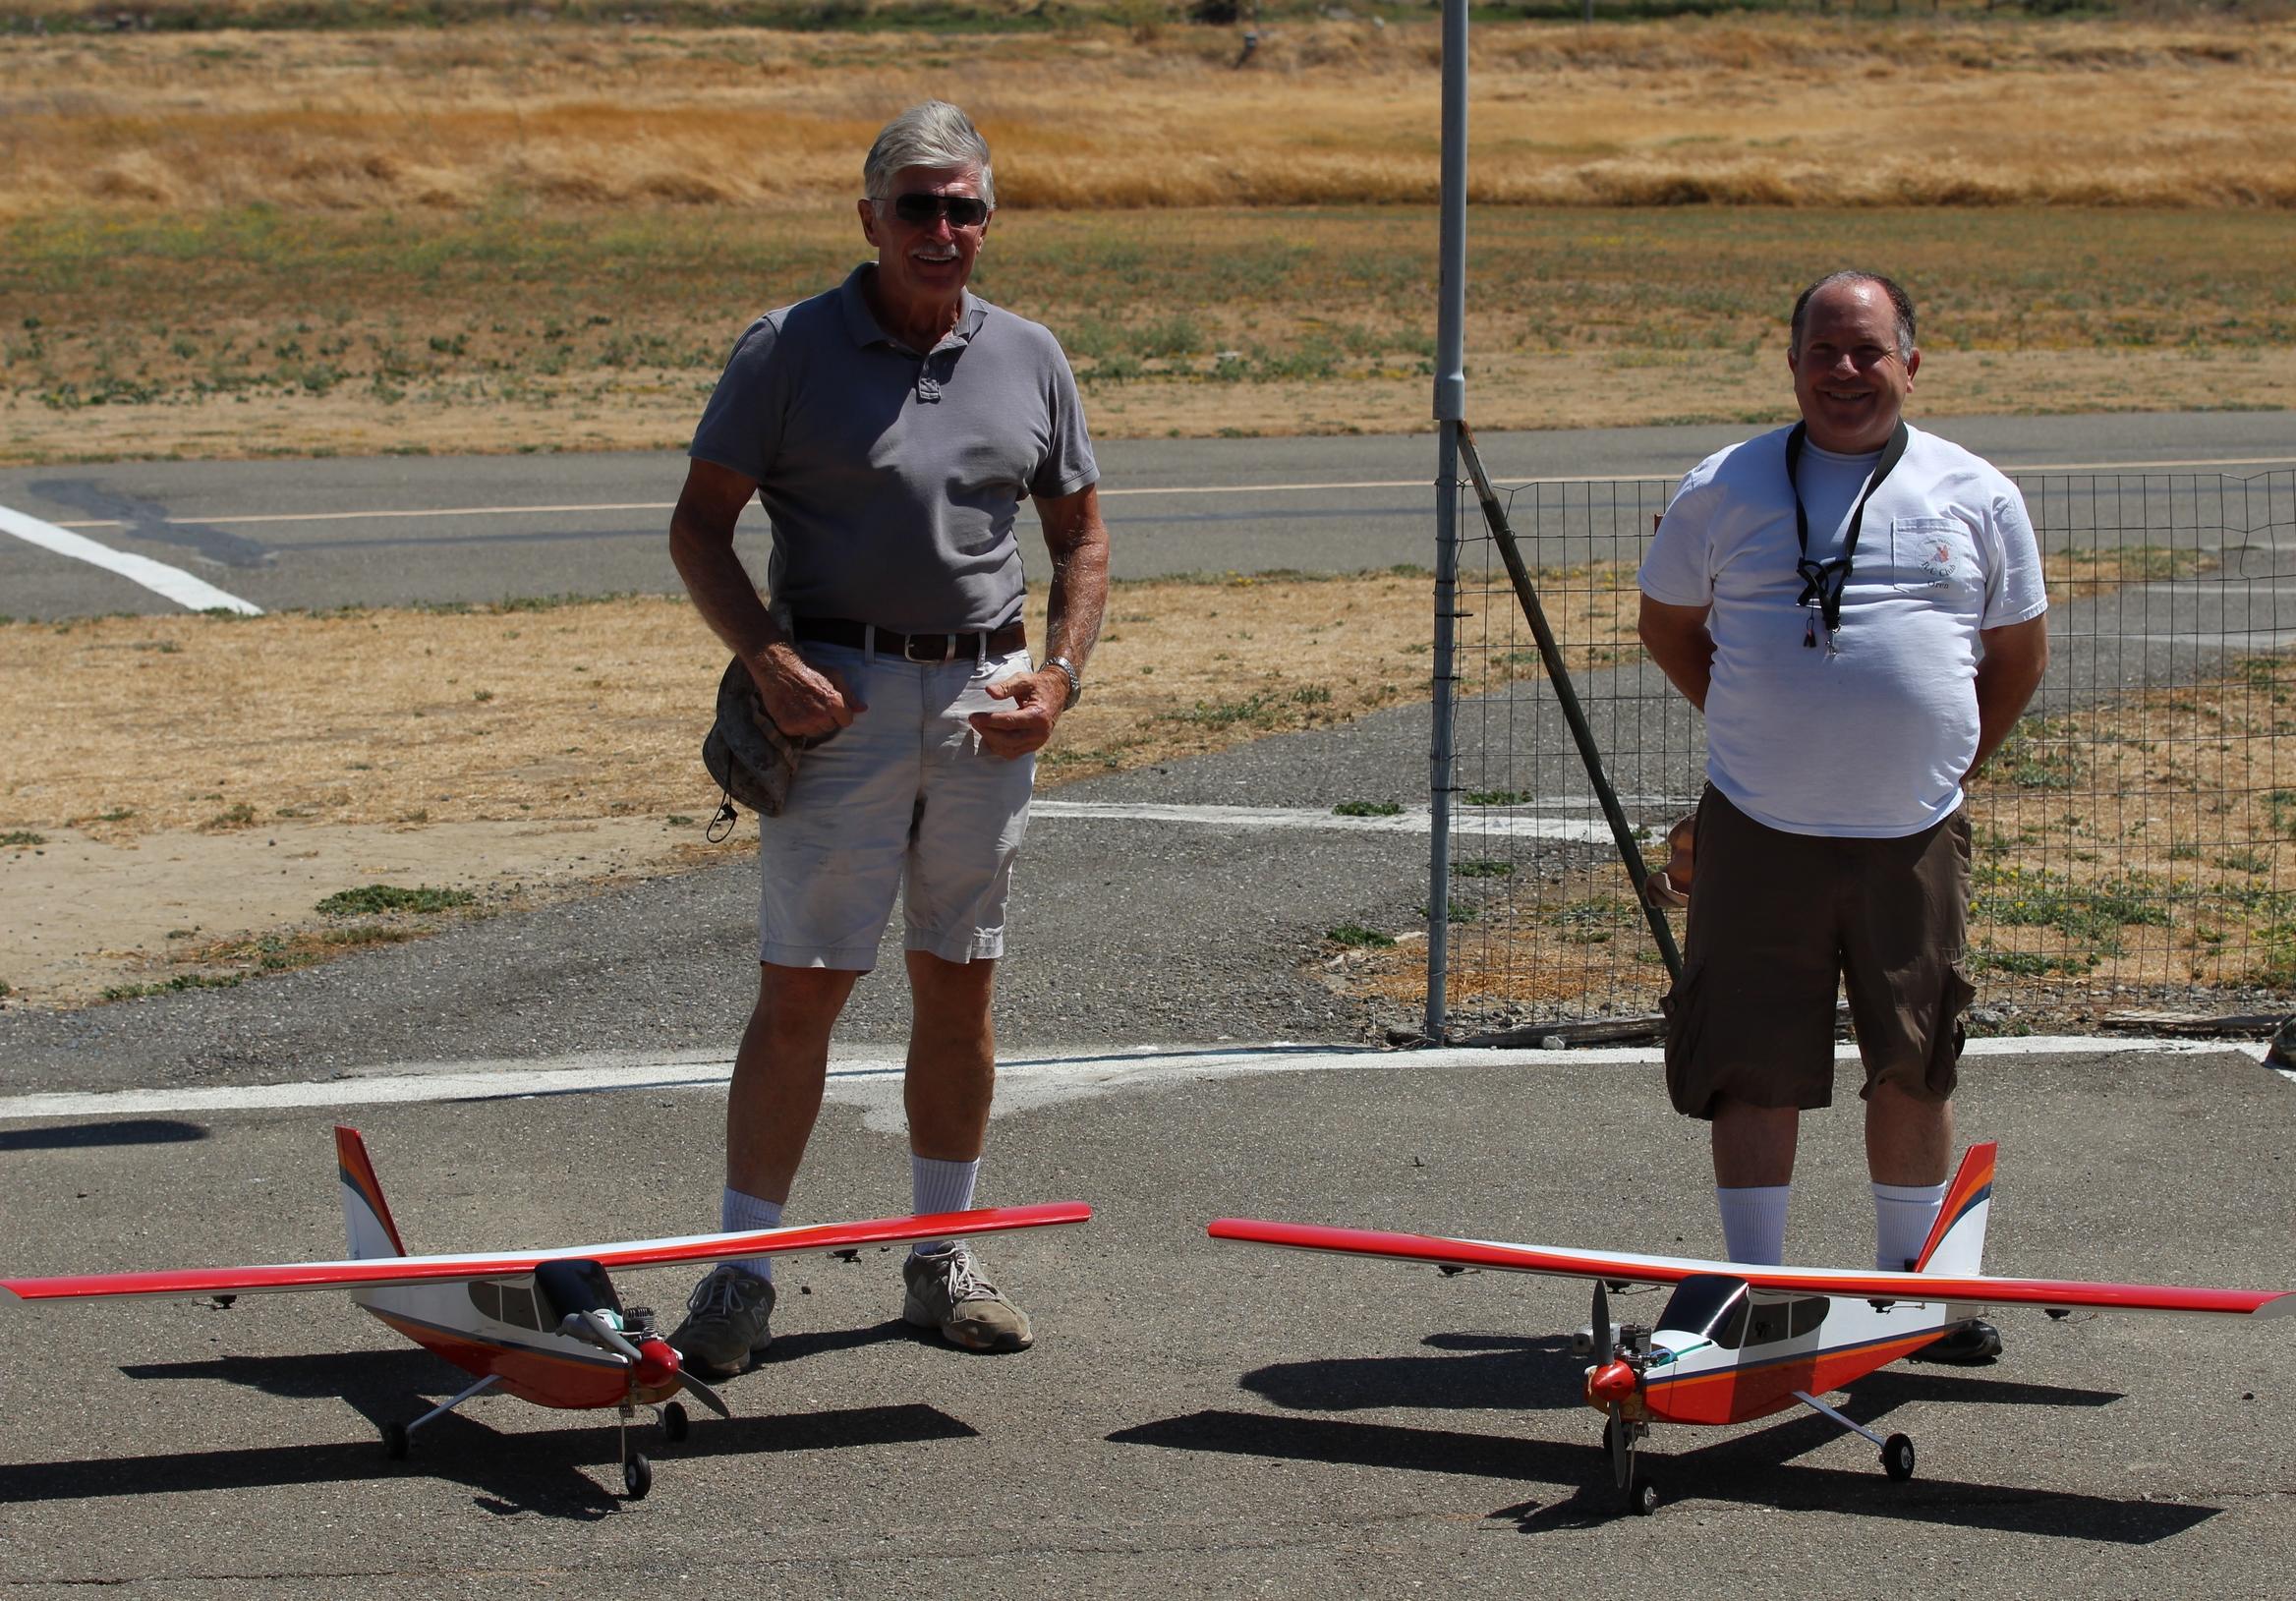 Bob Hurley and Oren Redsun with the Club   Avistar Elite .46 Trainers.